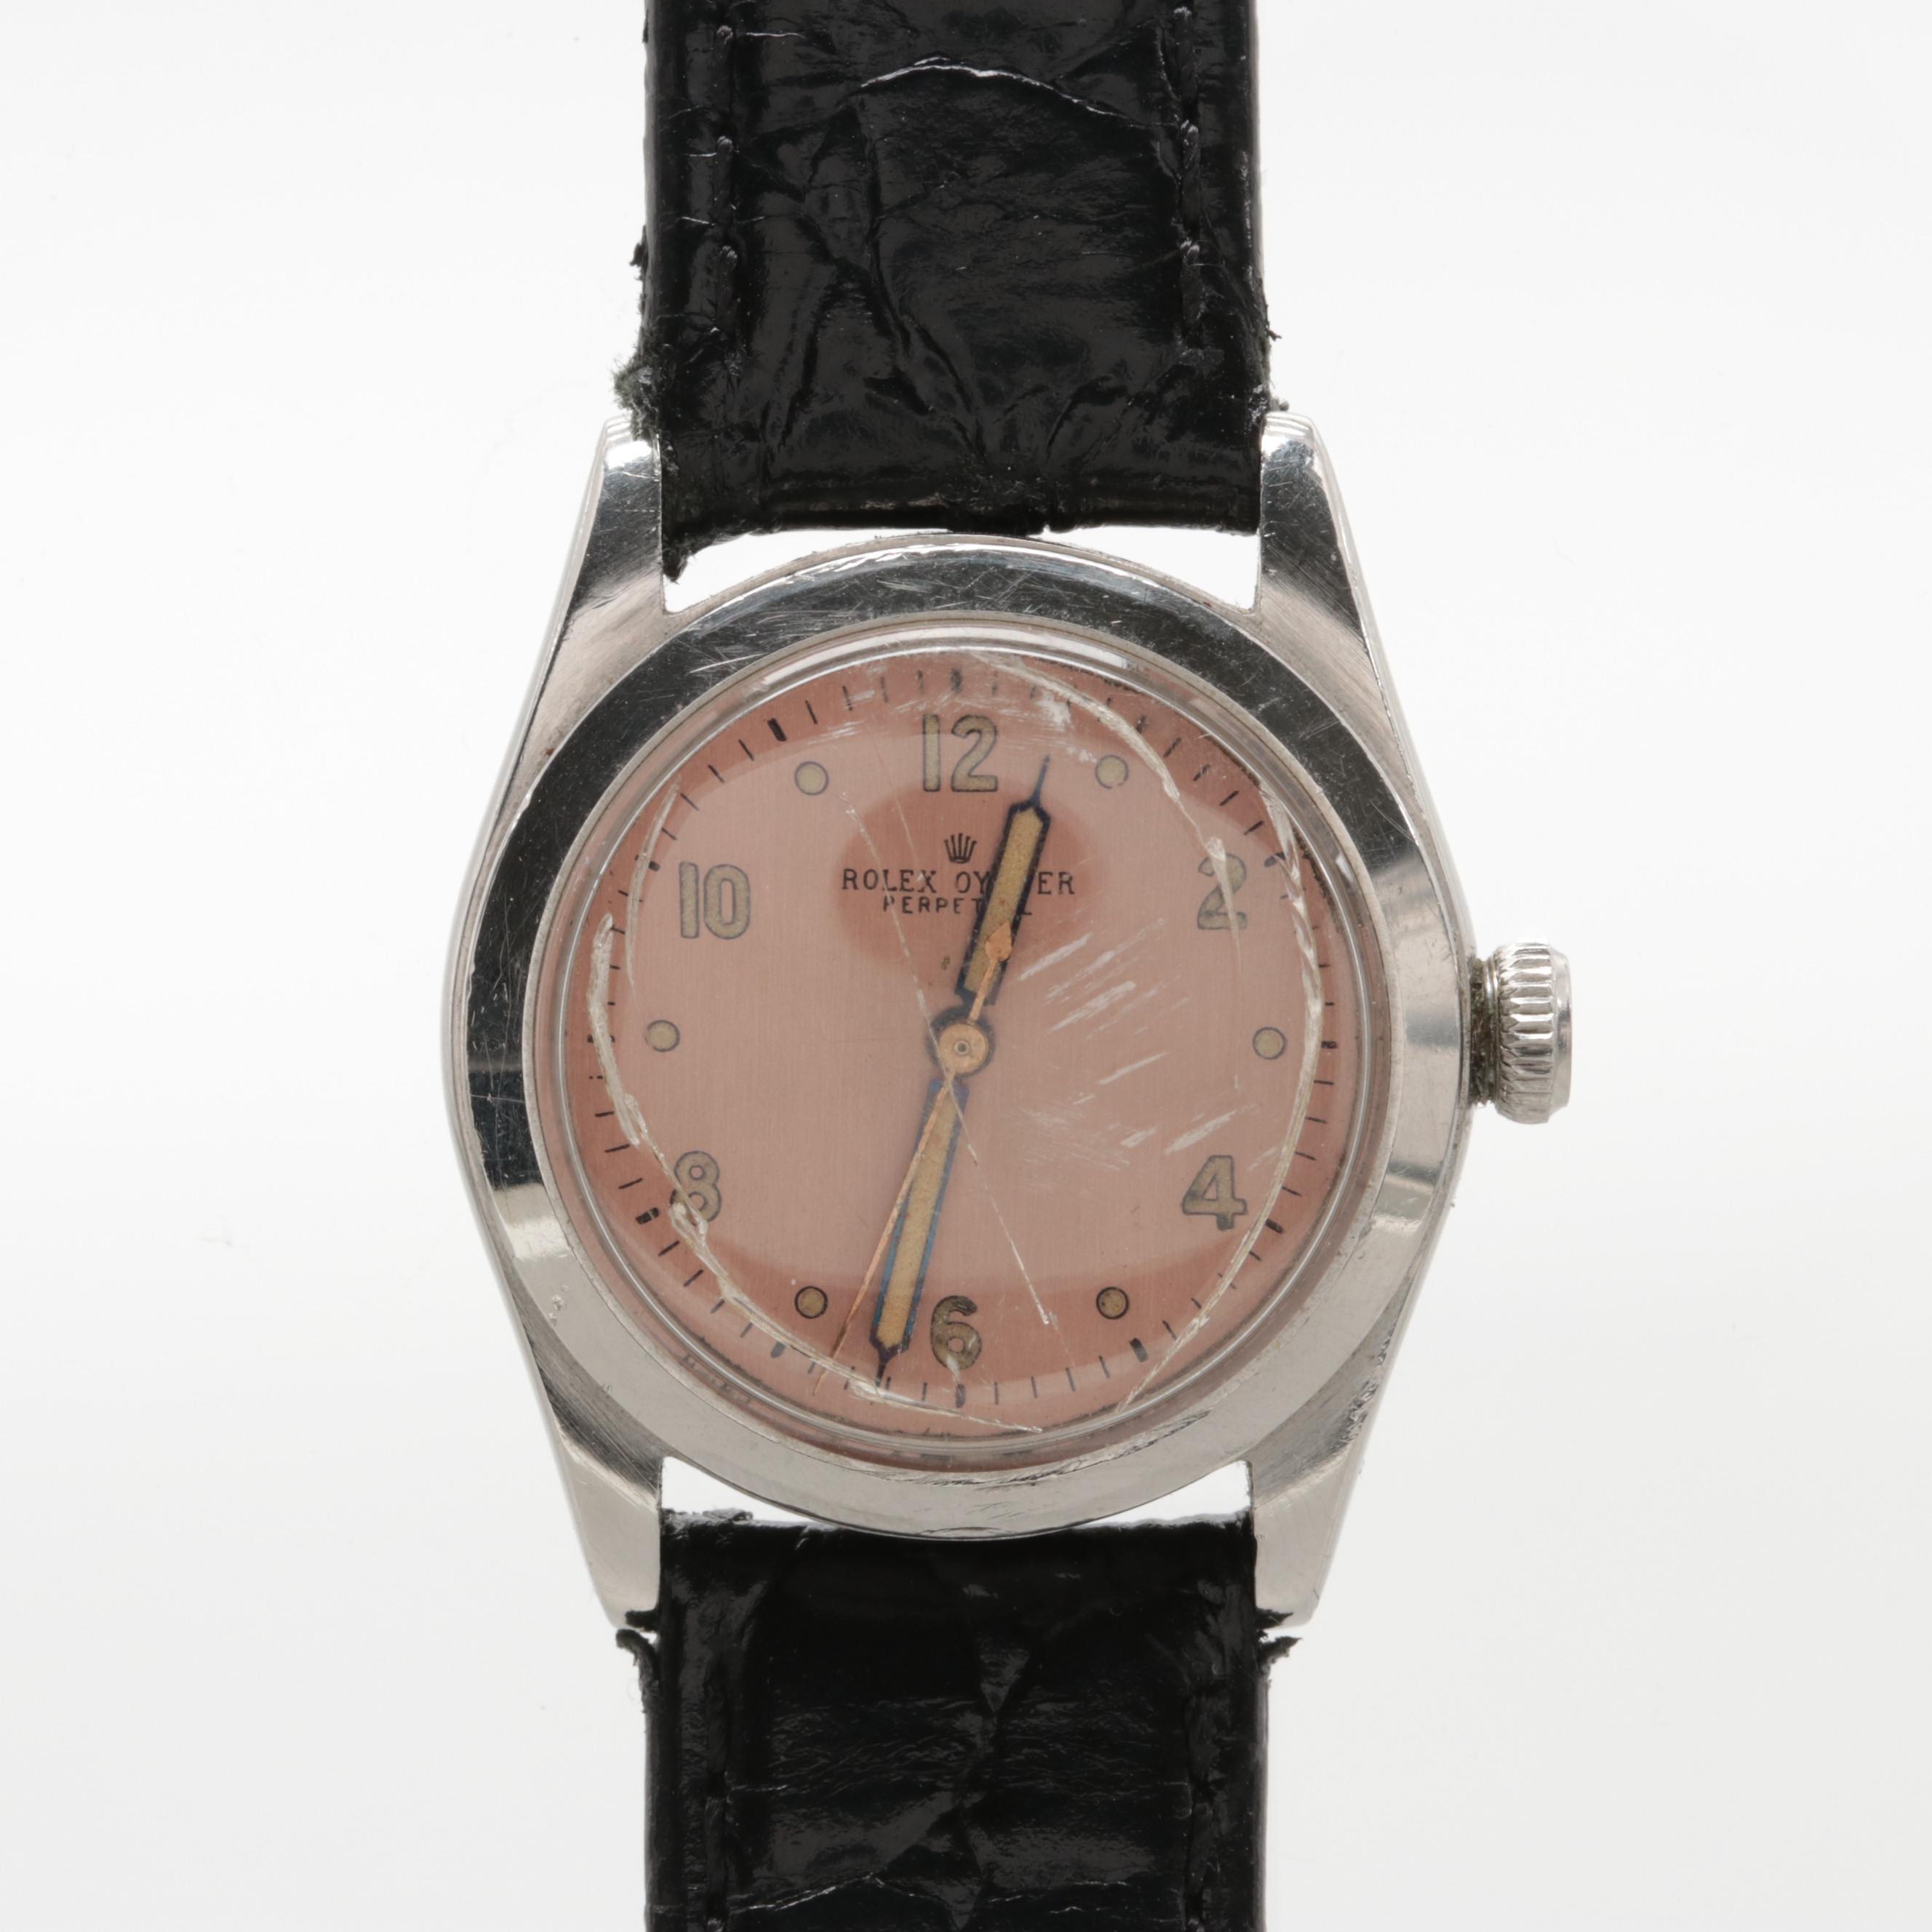 Circa 1946 Rolex Oyster Perpetual Wristwatch